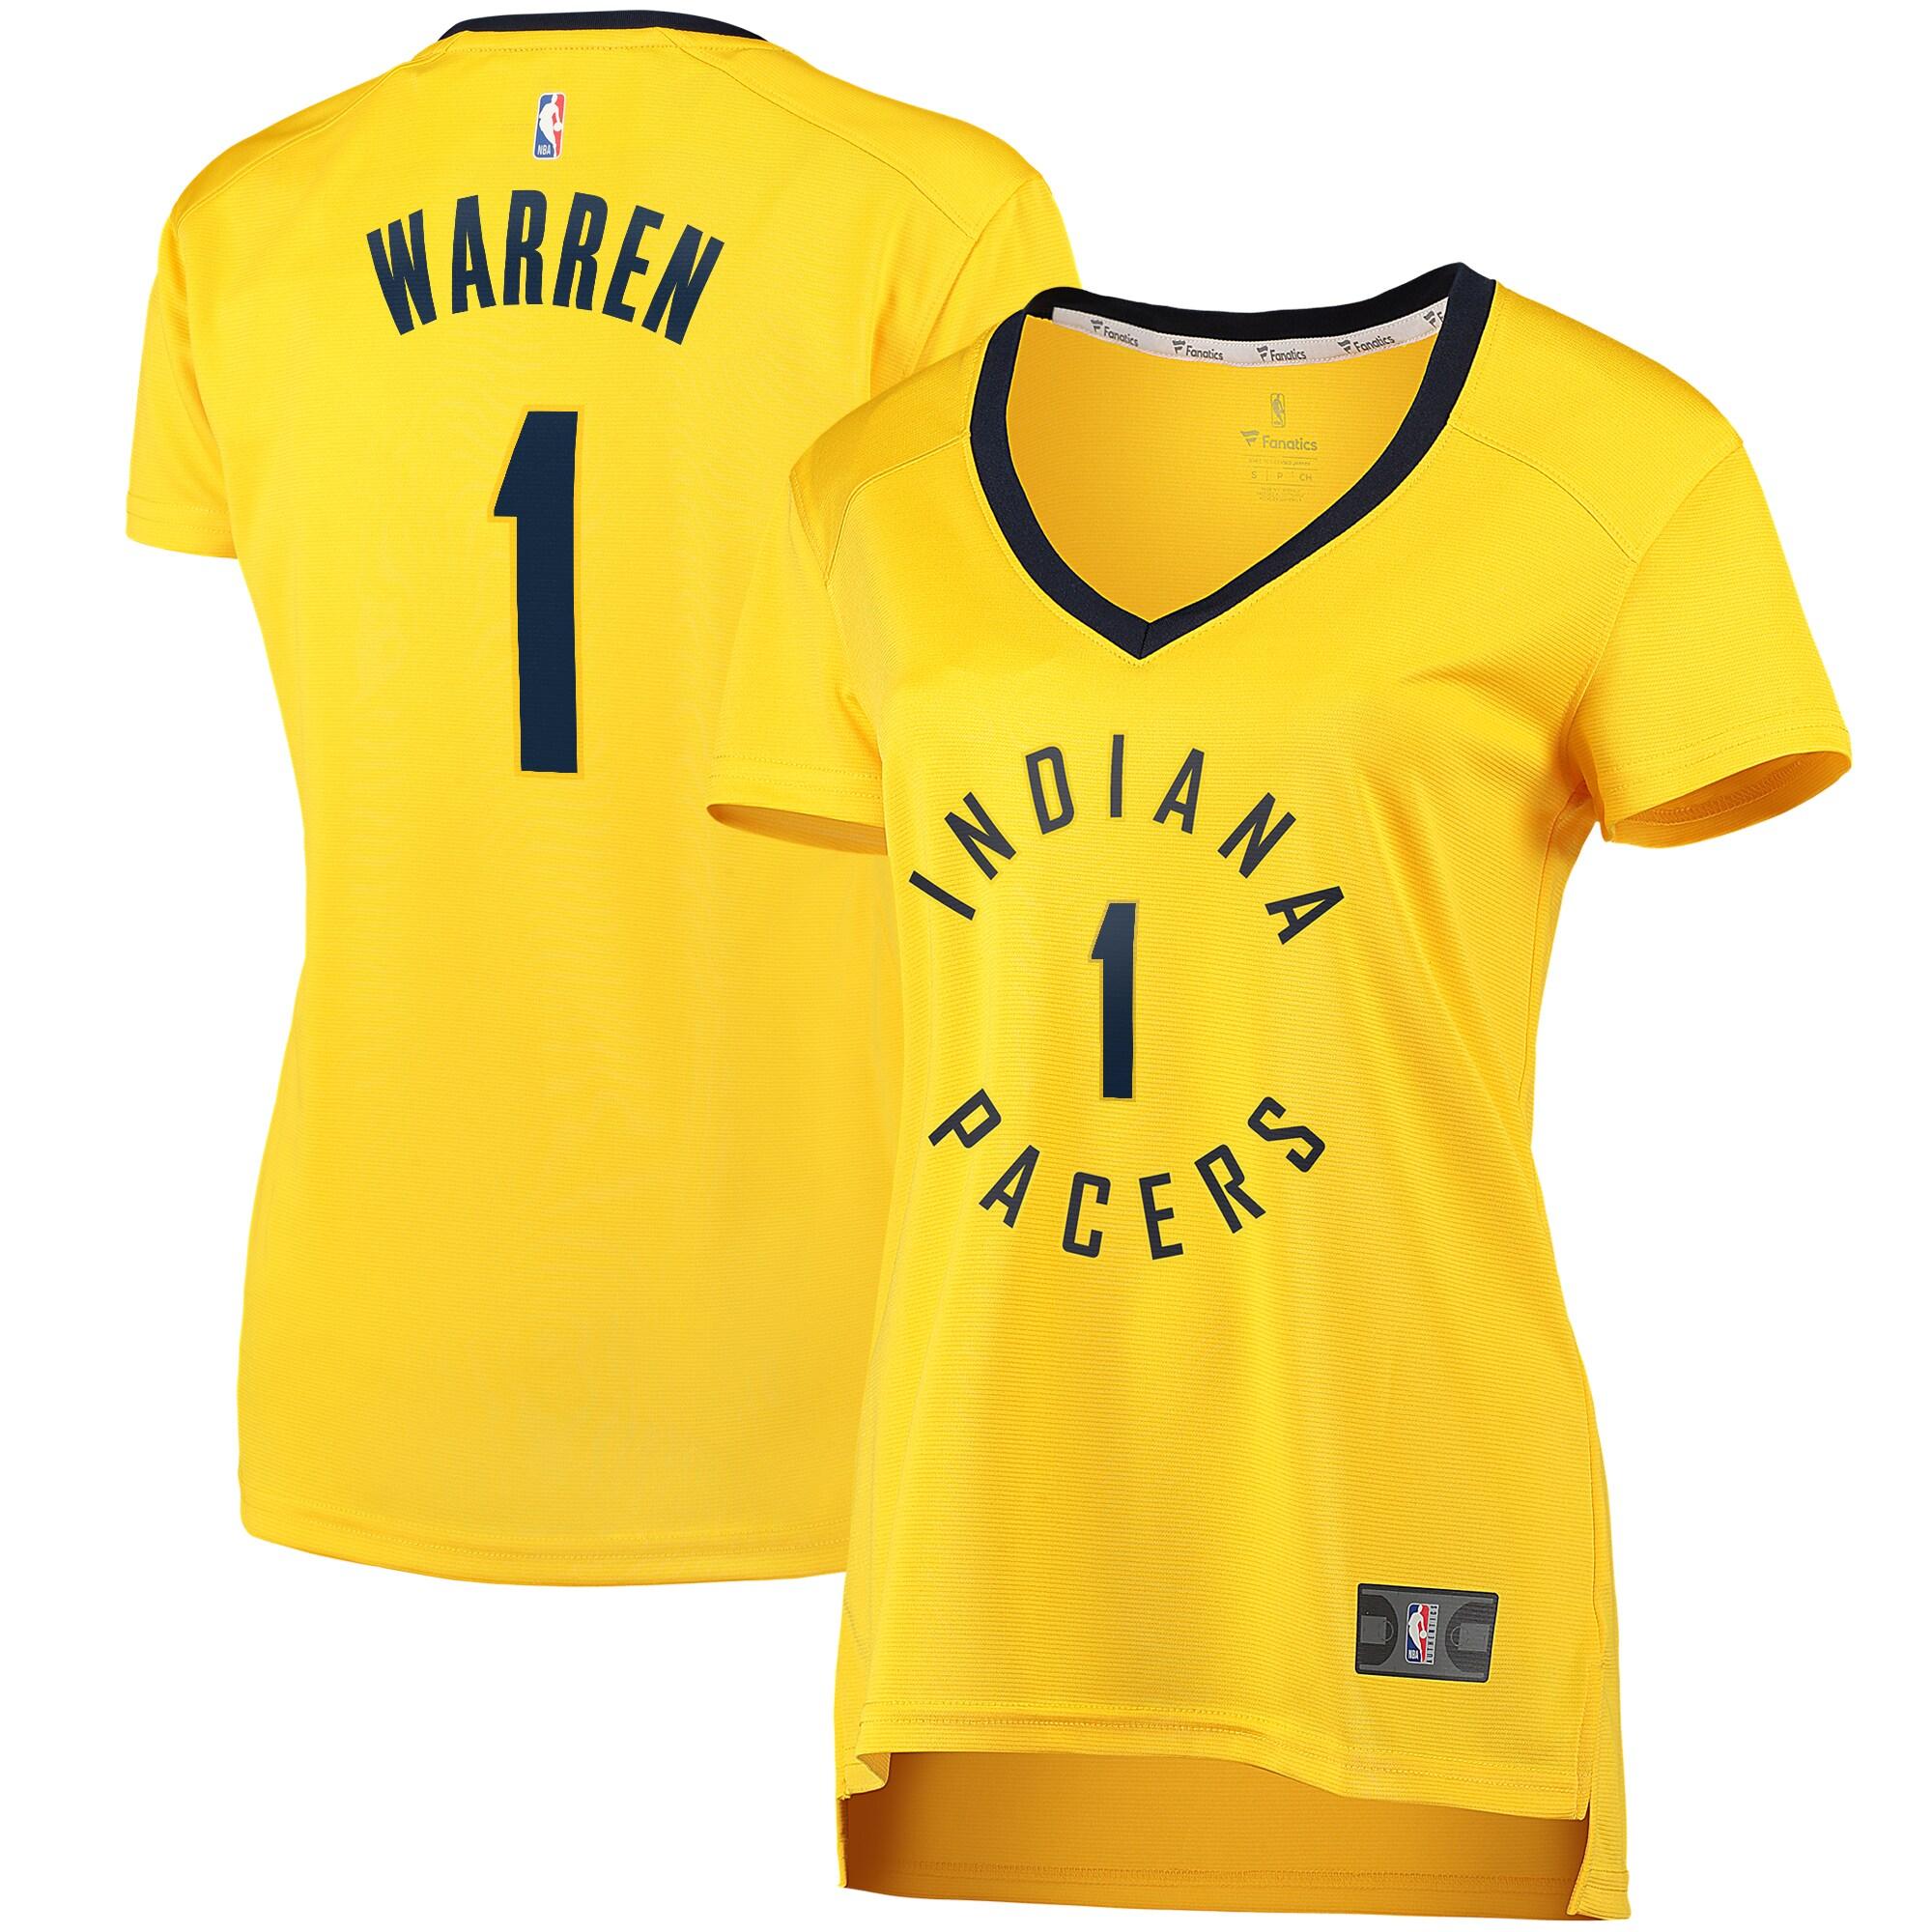 TJ Warren Indiana Pacers Fanatics Branded Women's Fast Break Player Replica Jersey - Statement Edition - Gold